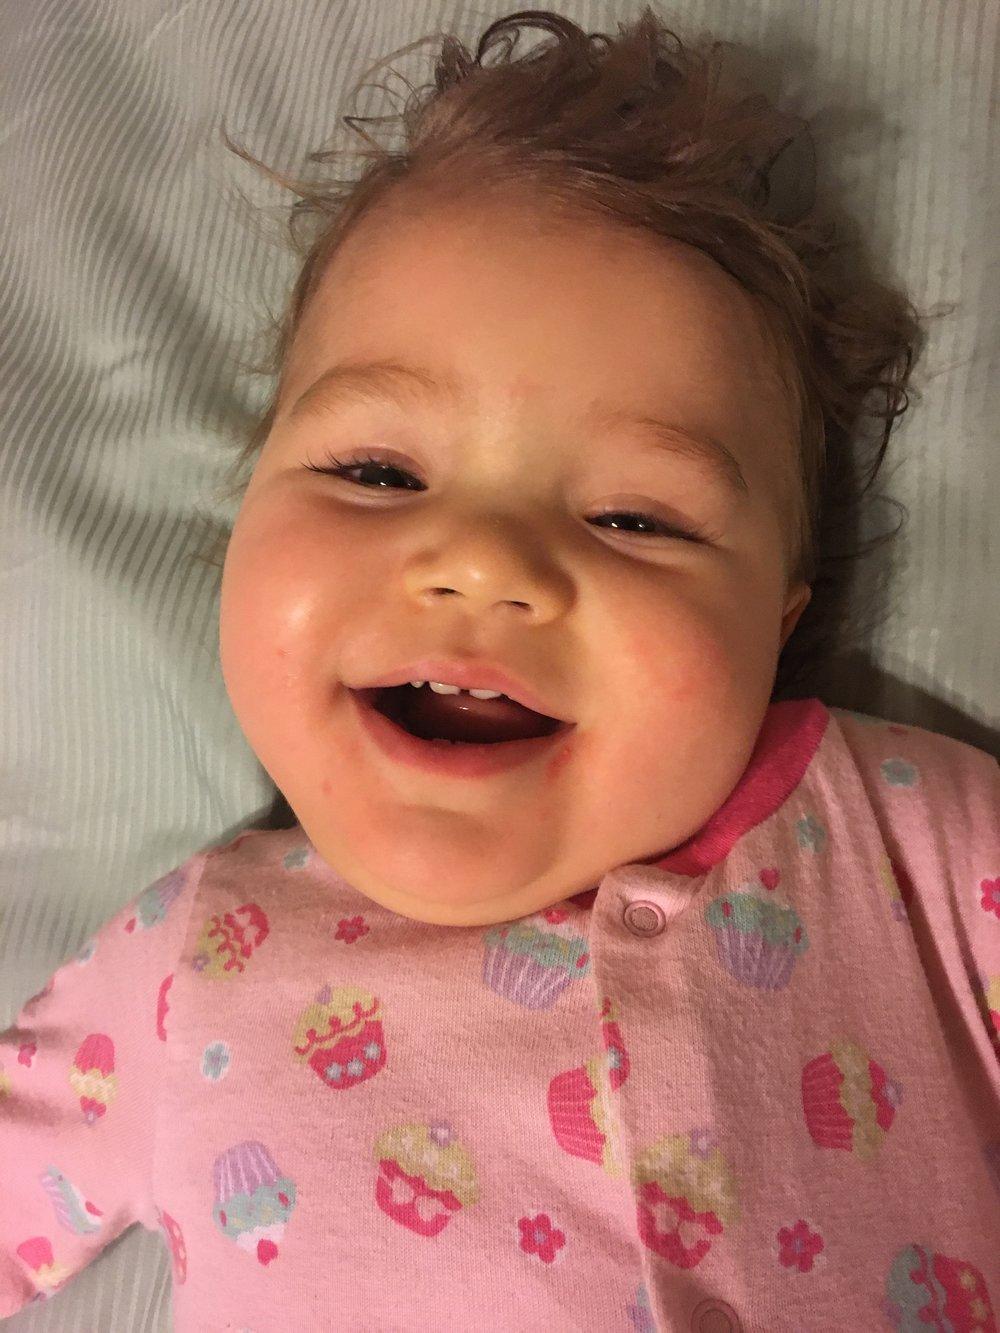 Post-bath smile